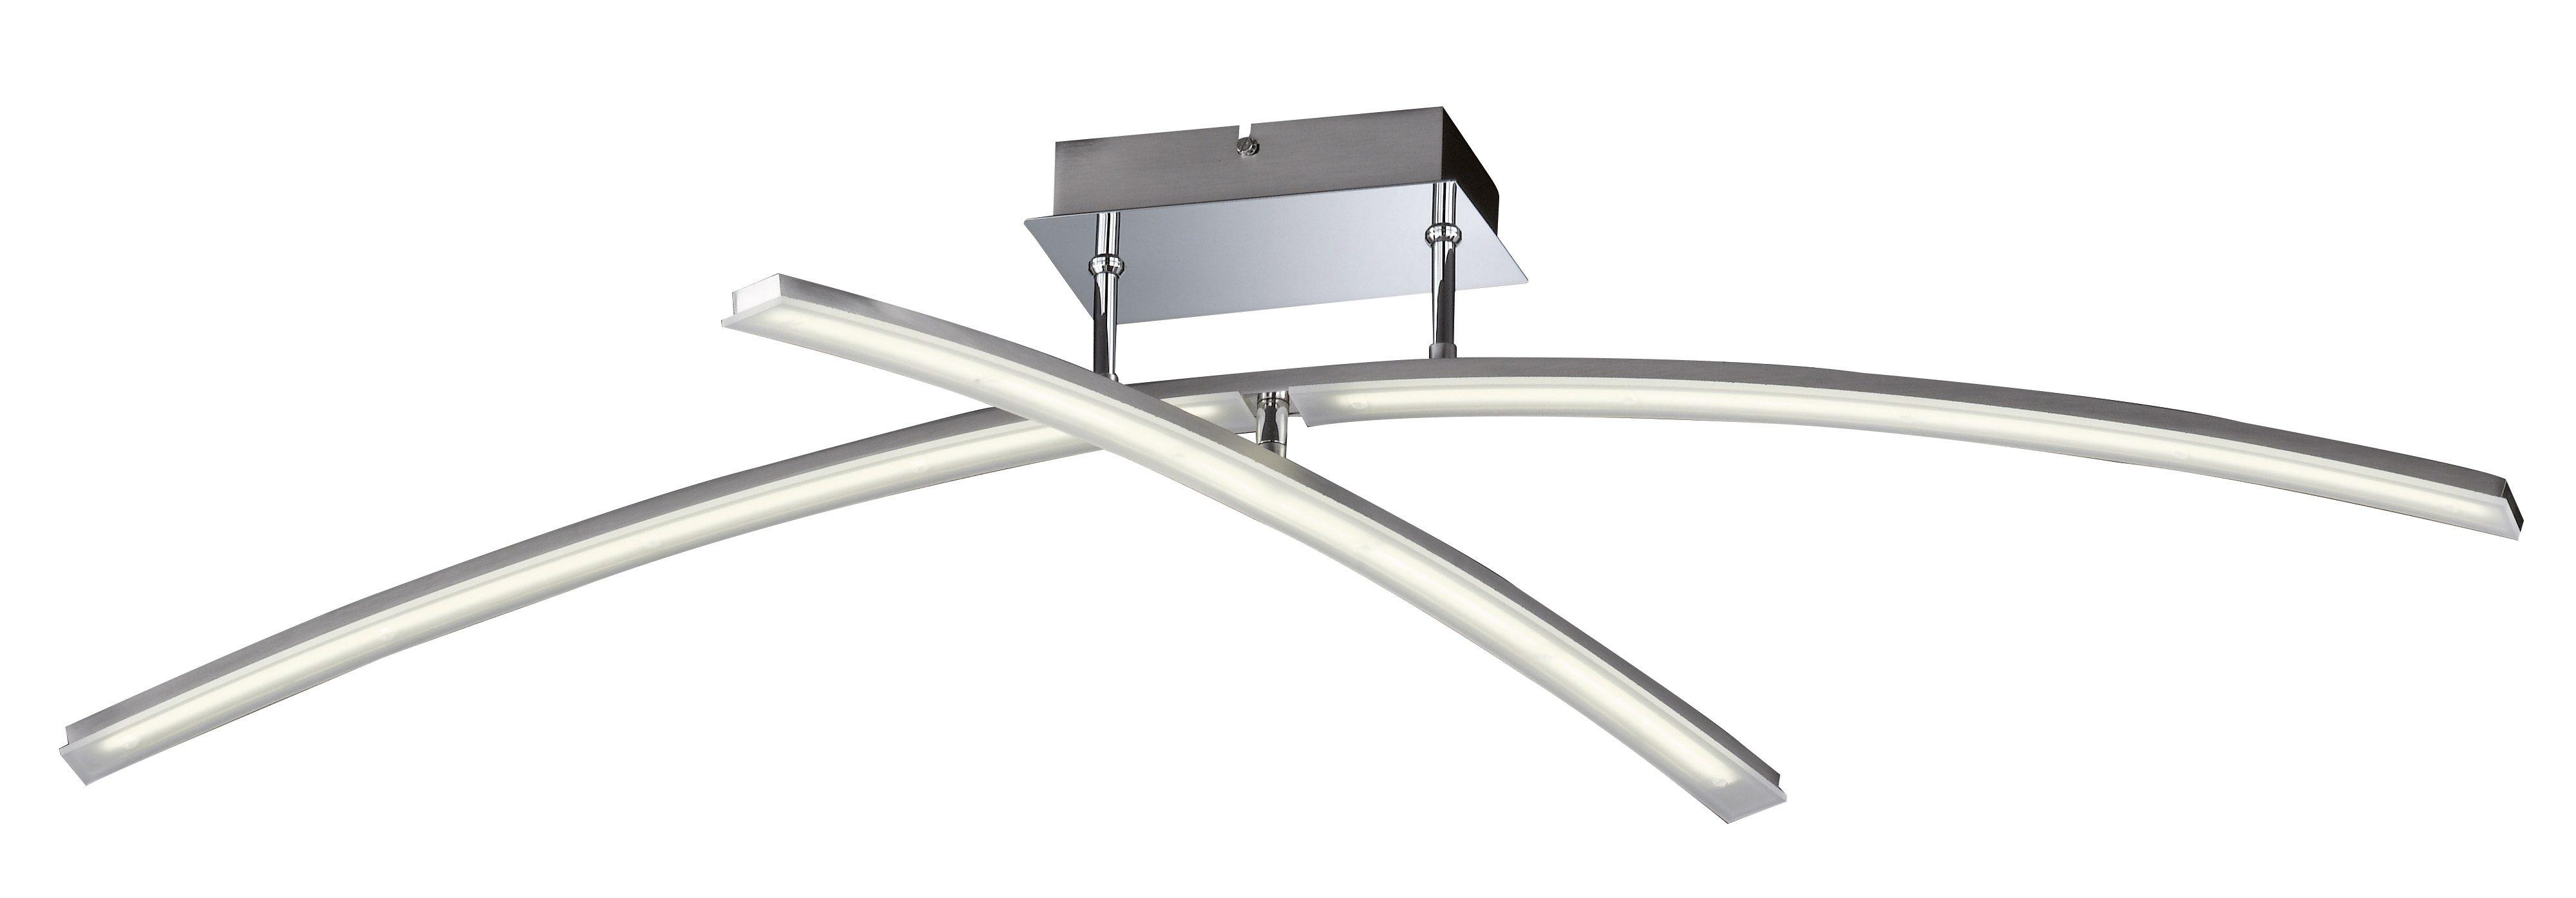 Honsel Leuchten LED-Deckenlleuchte, 2flg., »MIKADO«